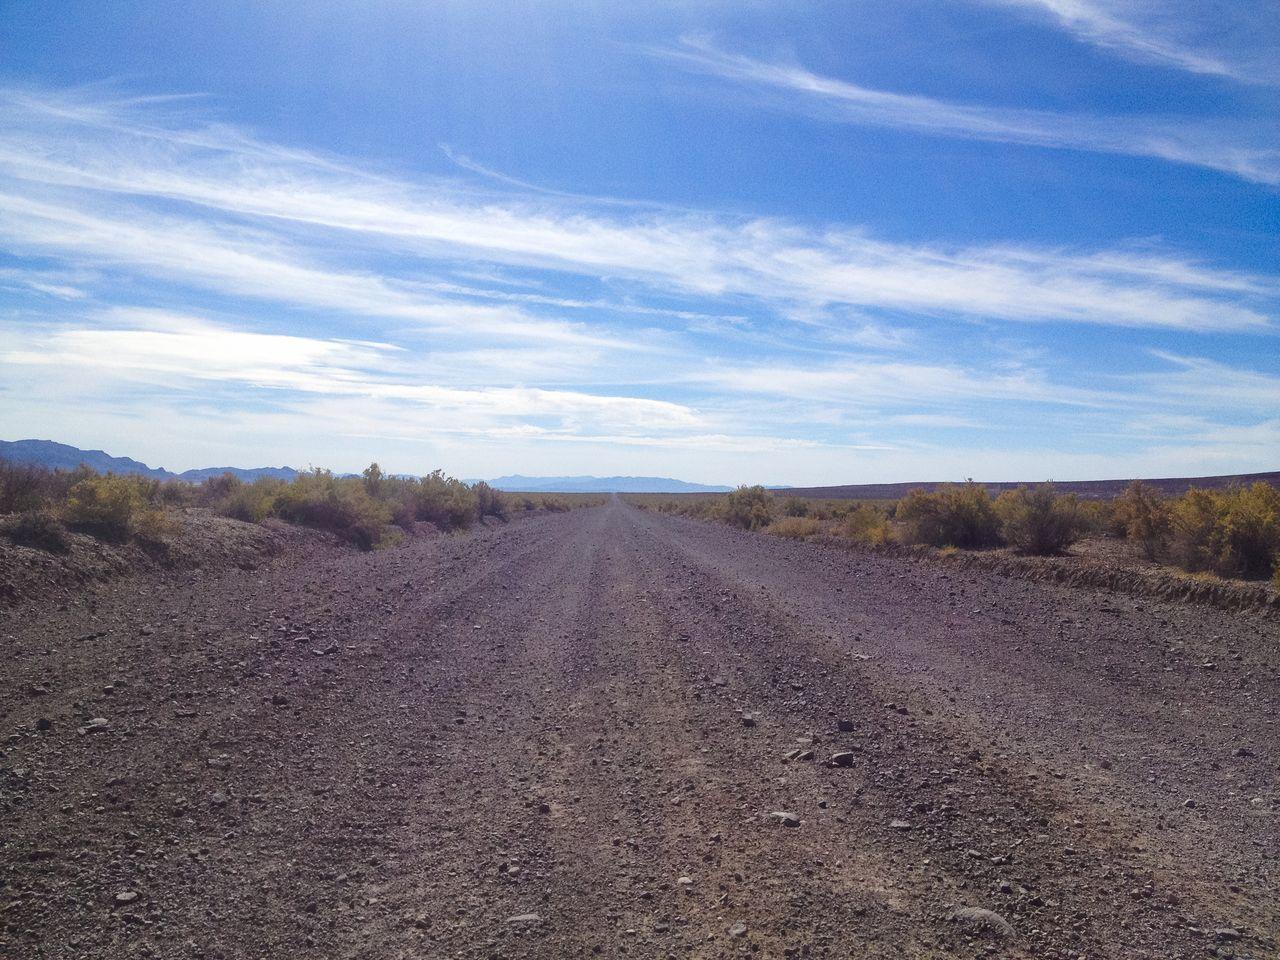 Road through the Black Rock Desert area in Northern Nevada. Arid Climate Arid Landscape Barren Black Rock Desert Blue Sky Desert Desert Landscape Desert Road Horizon Horizon Over Land Outdoors Remote Road Sagebrush Sand